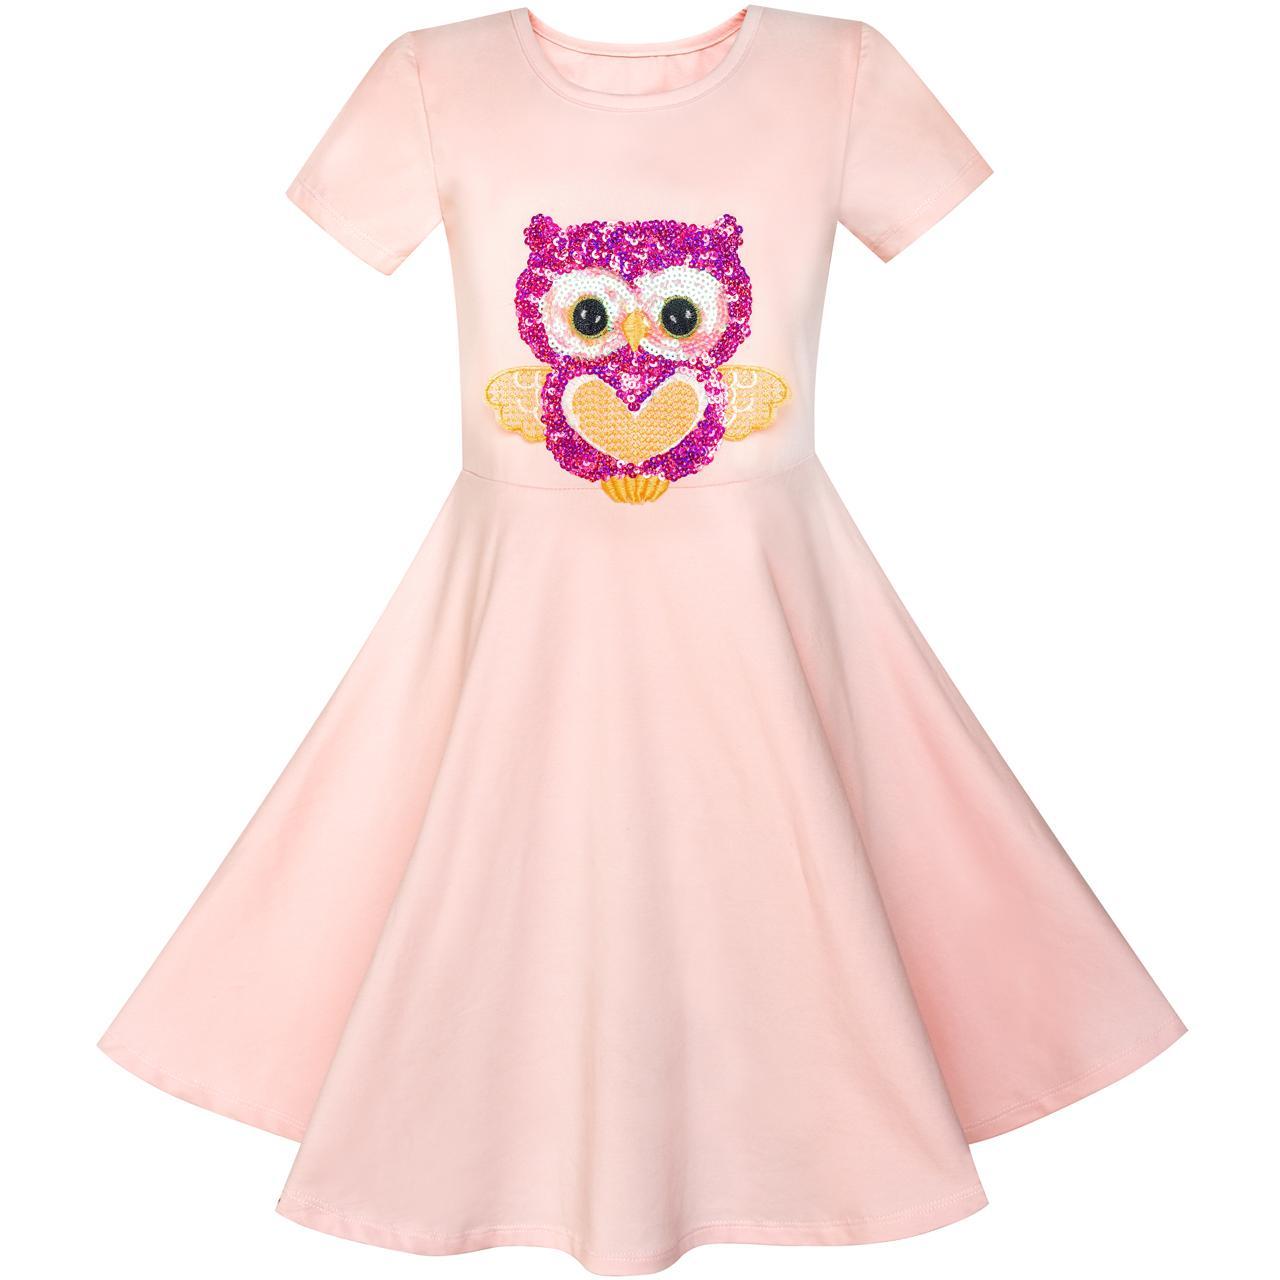 Girls Dress Misty Rose Owl Sequin Cotton Dress 2018 Summer Princess Wedding Party Dresses Kids Clothes Size 4-8 Pageant Sundress